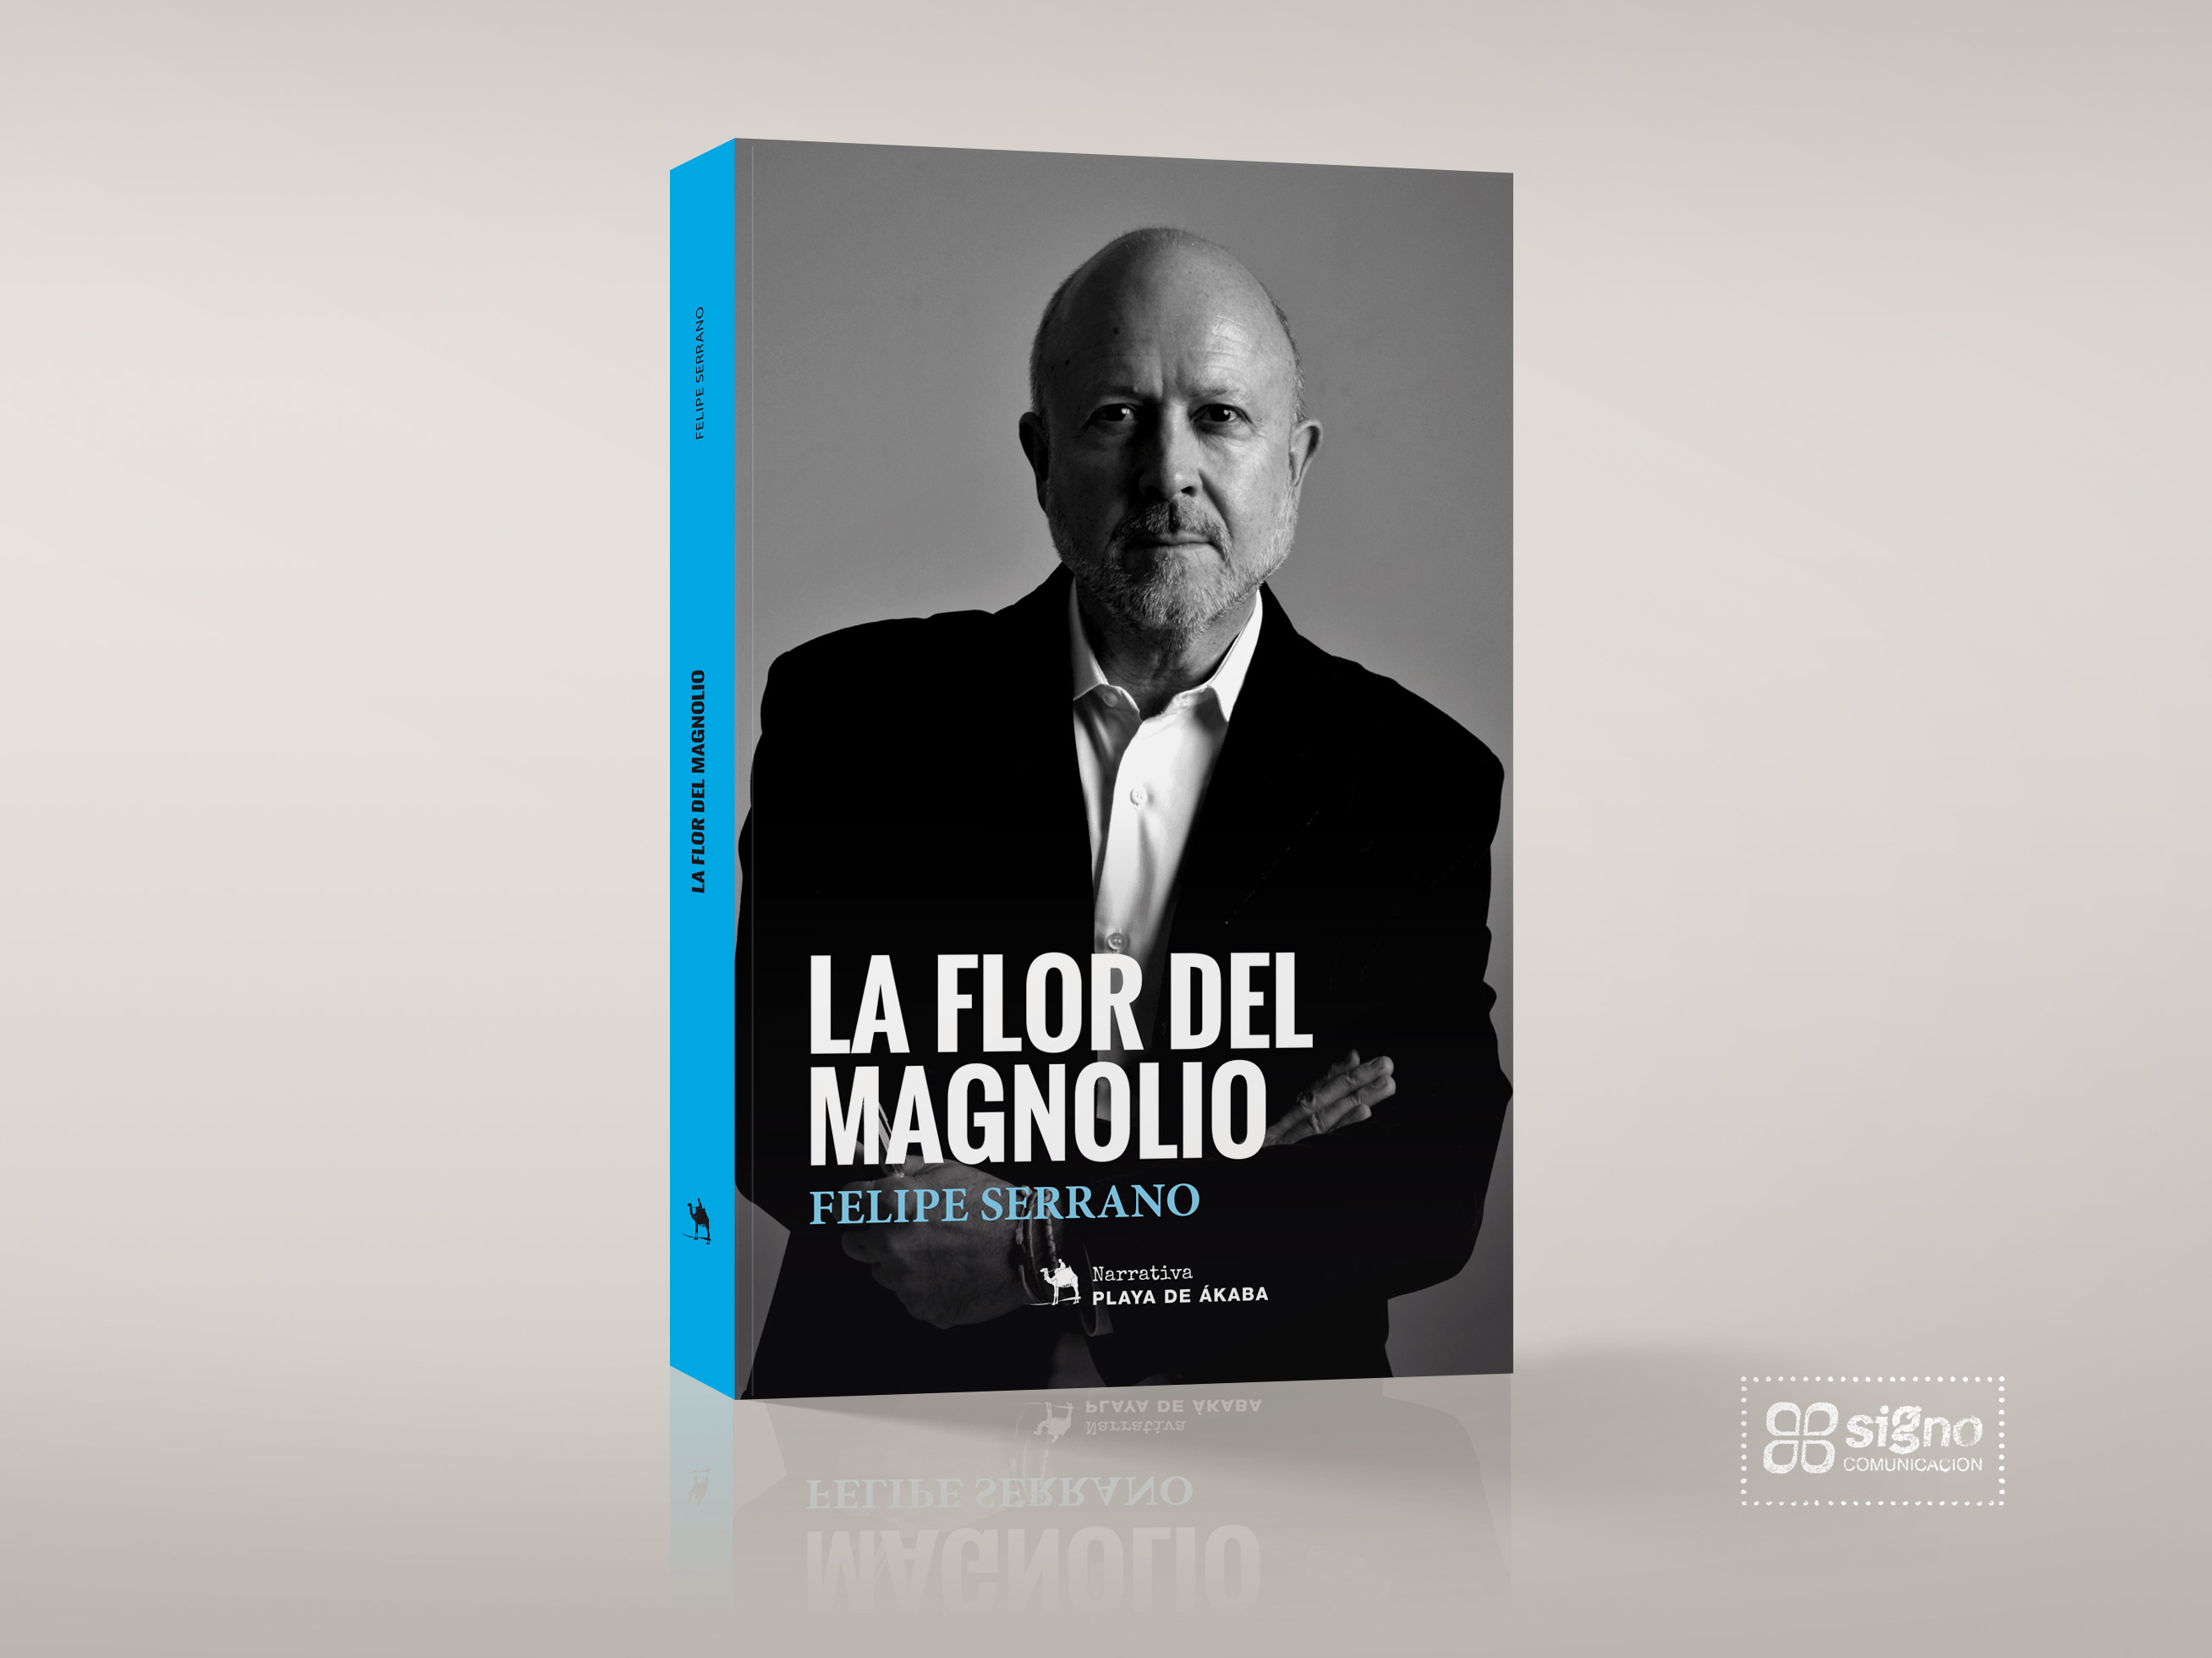 editorial-playa-akaba-libros-0.